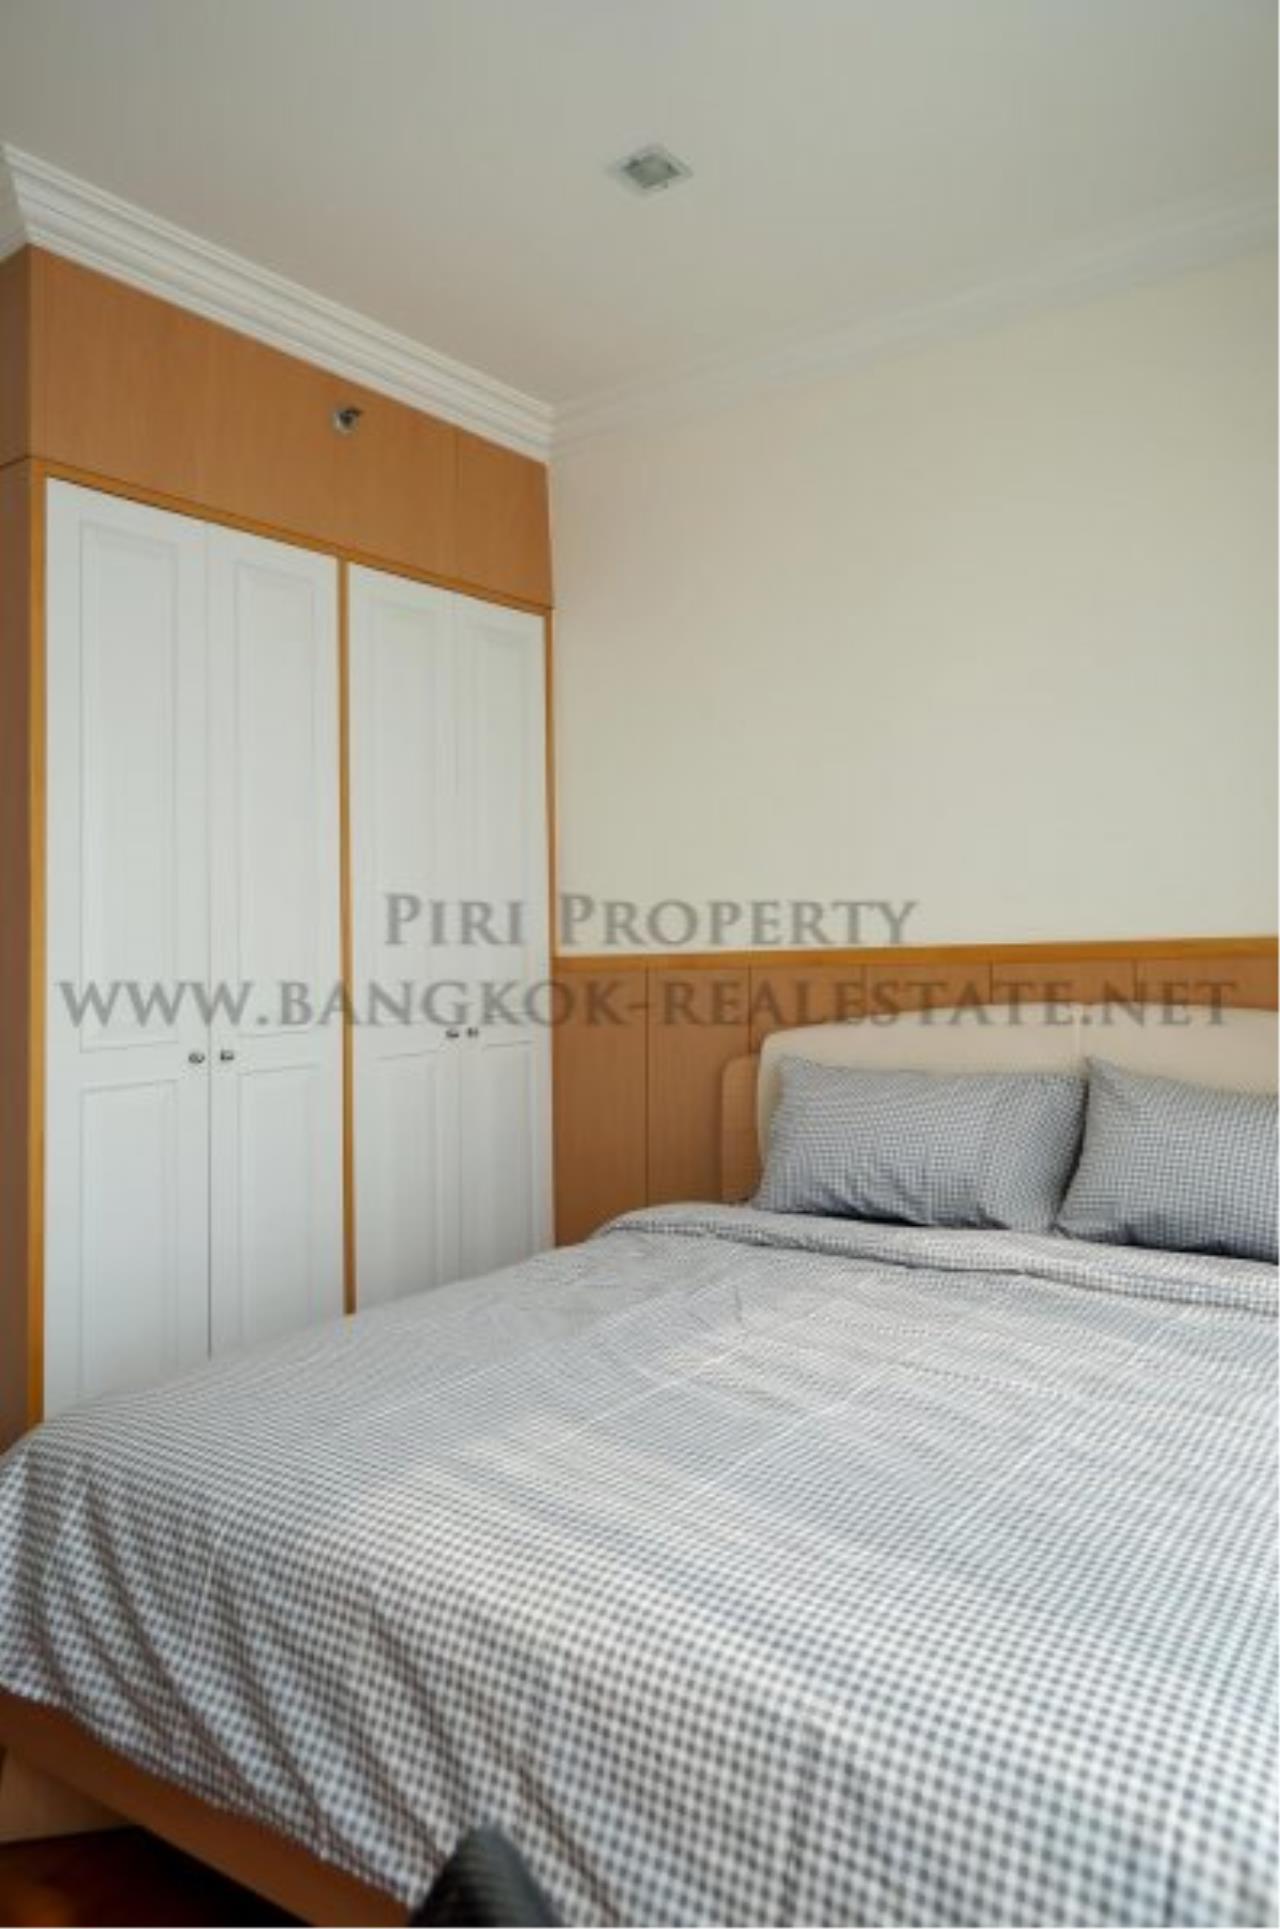 Piri Property Agency's Renovated Condo in Baan Piya Sathorn for Rent - 2 Bedrooms 8